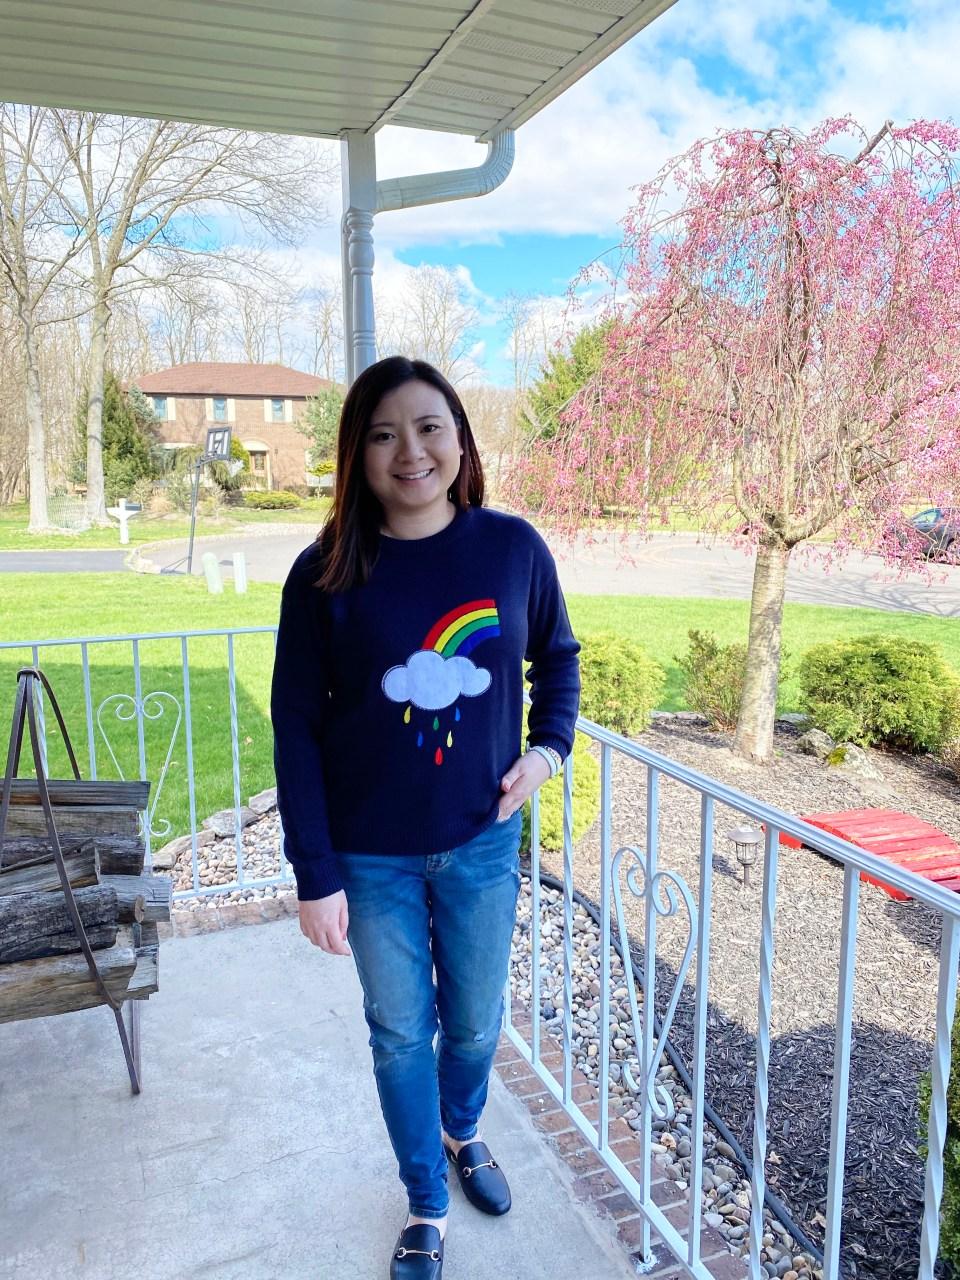 Rainbow & Cloud Sweater